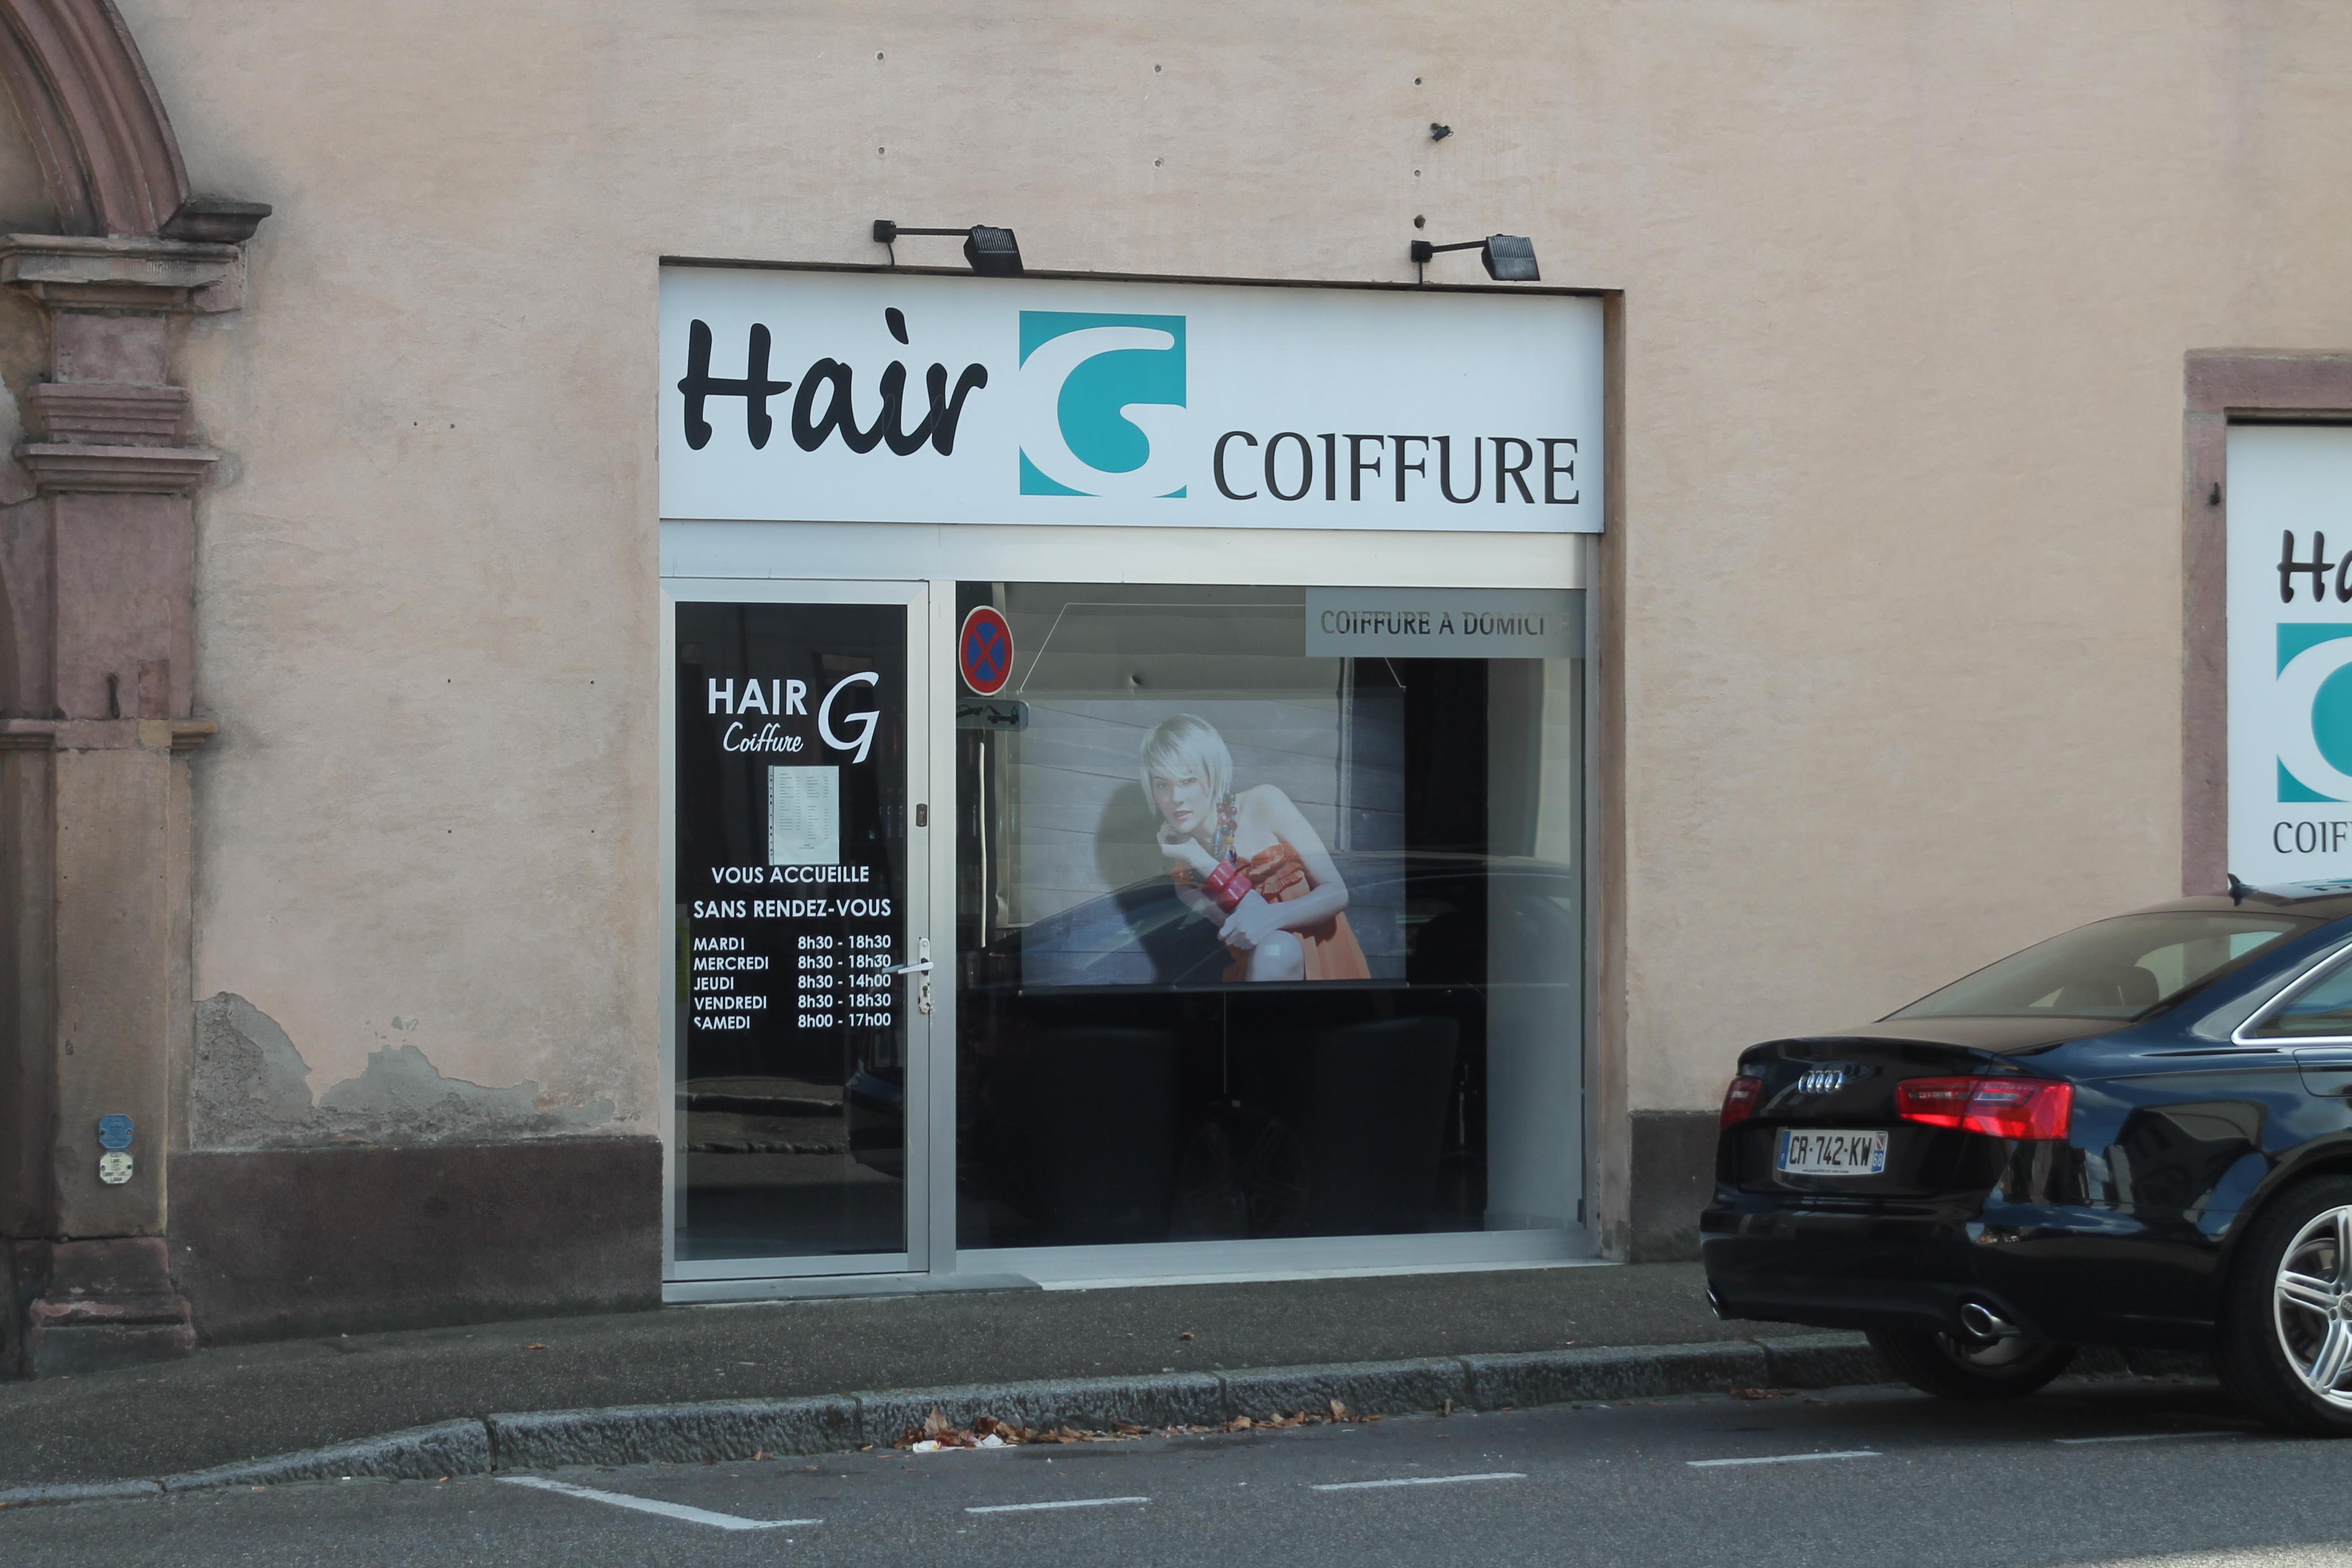 Hair g coiffure